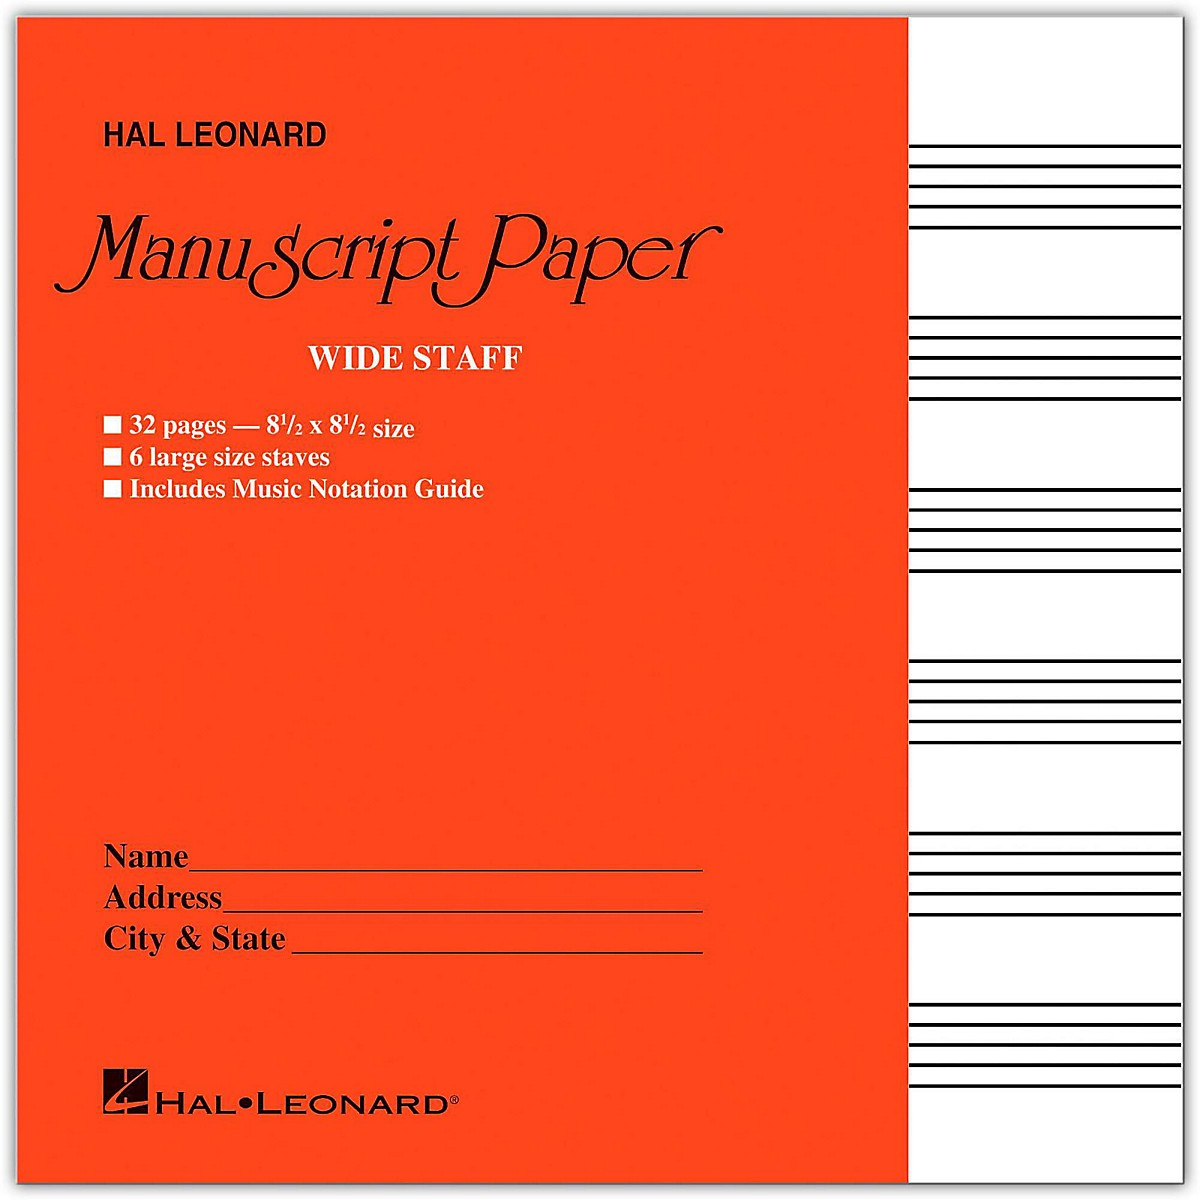 Hal Leonard Wide Staff Manuscript Paper (Red Cover)